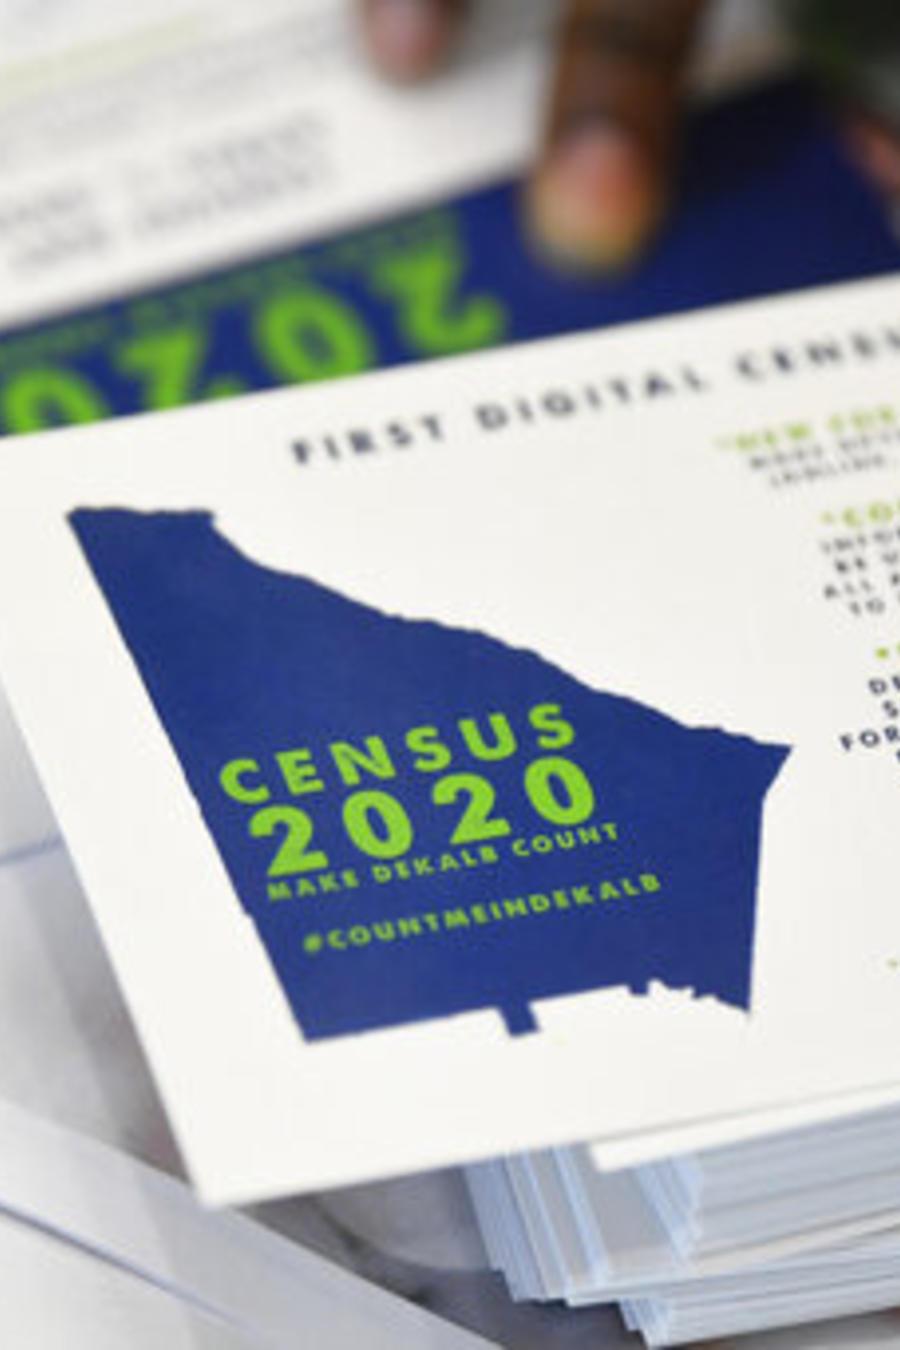 Tarjeta para promover el Censo 2020